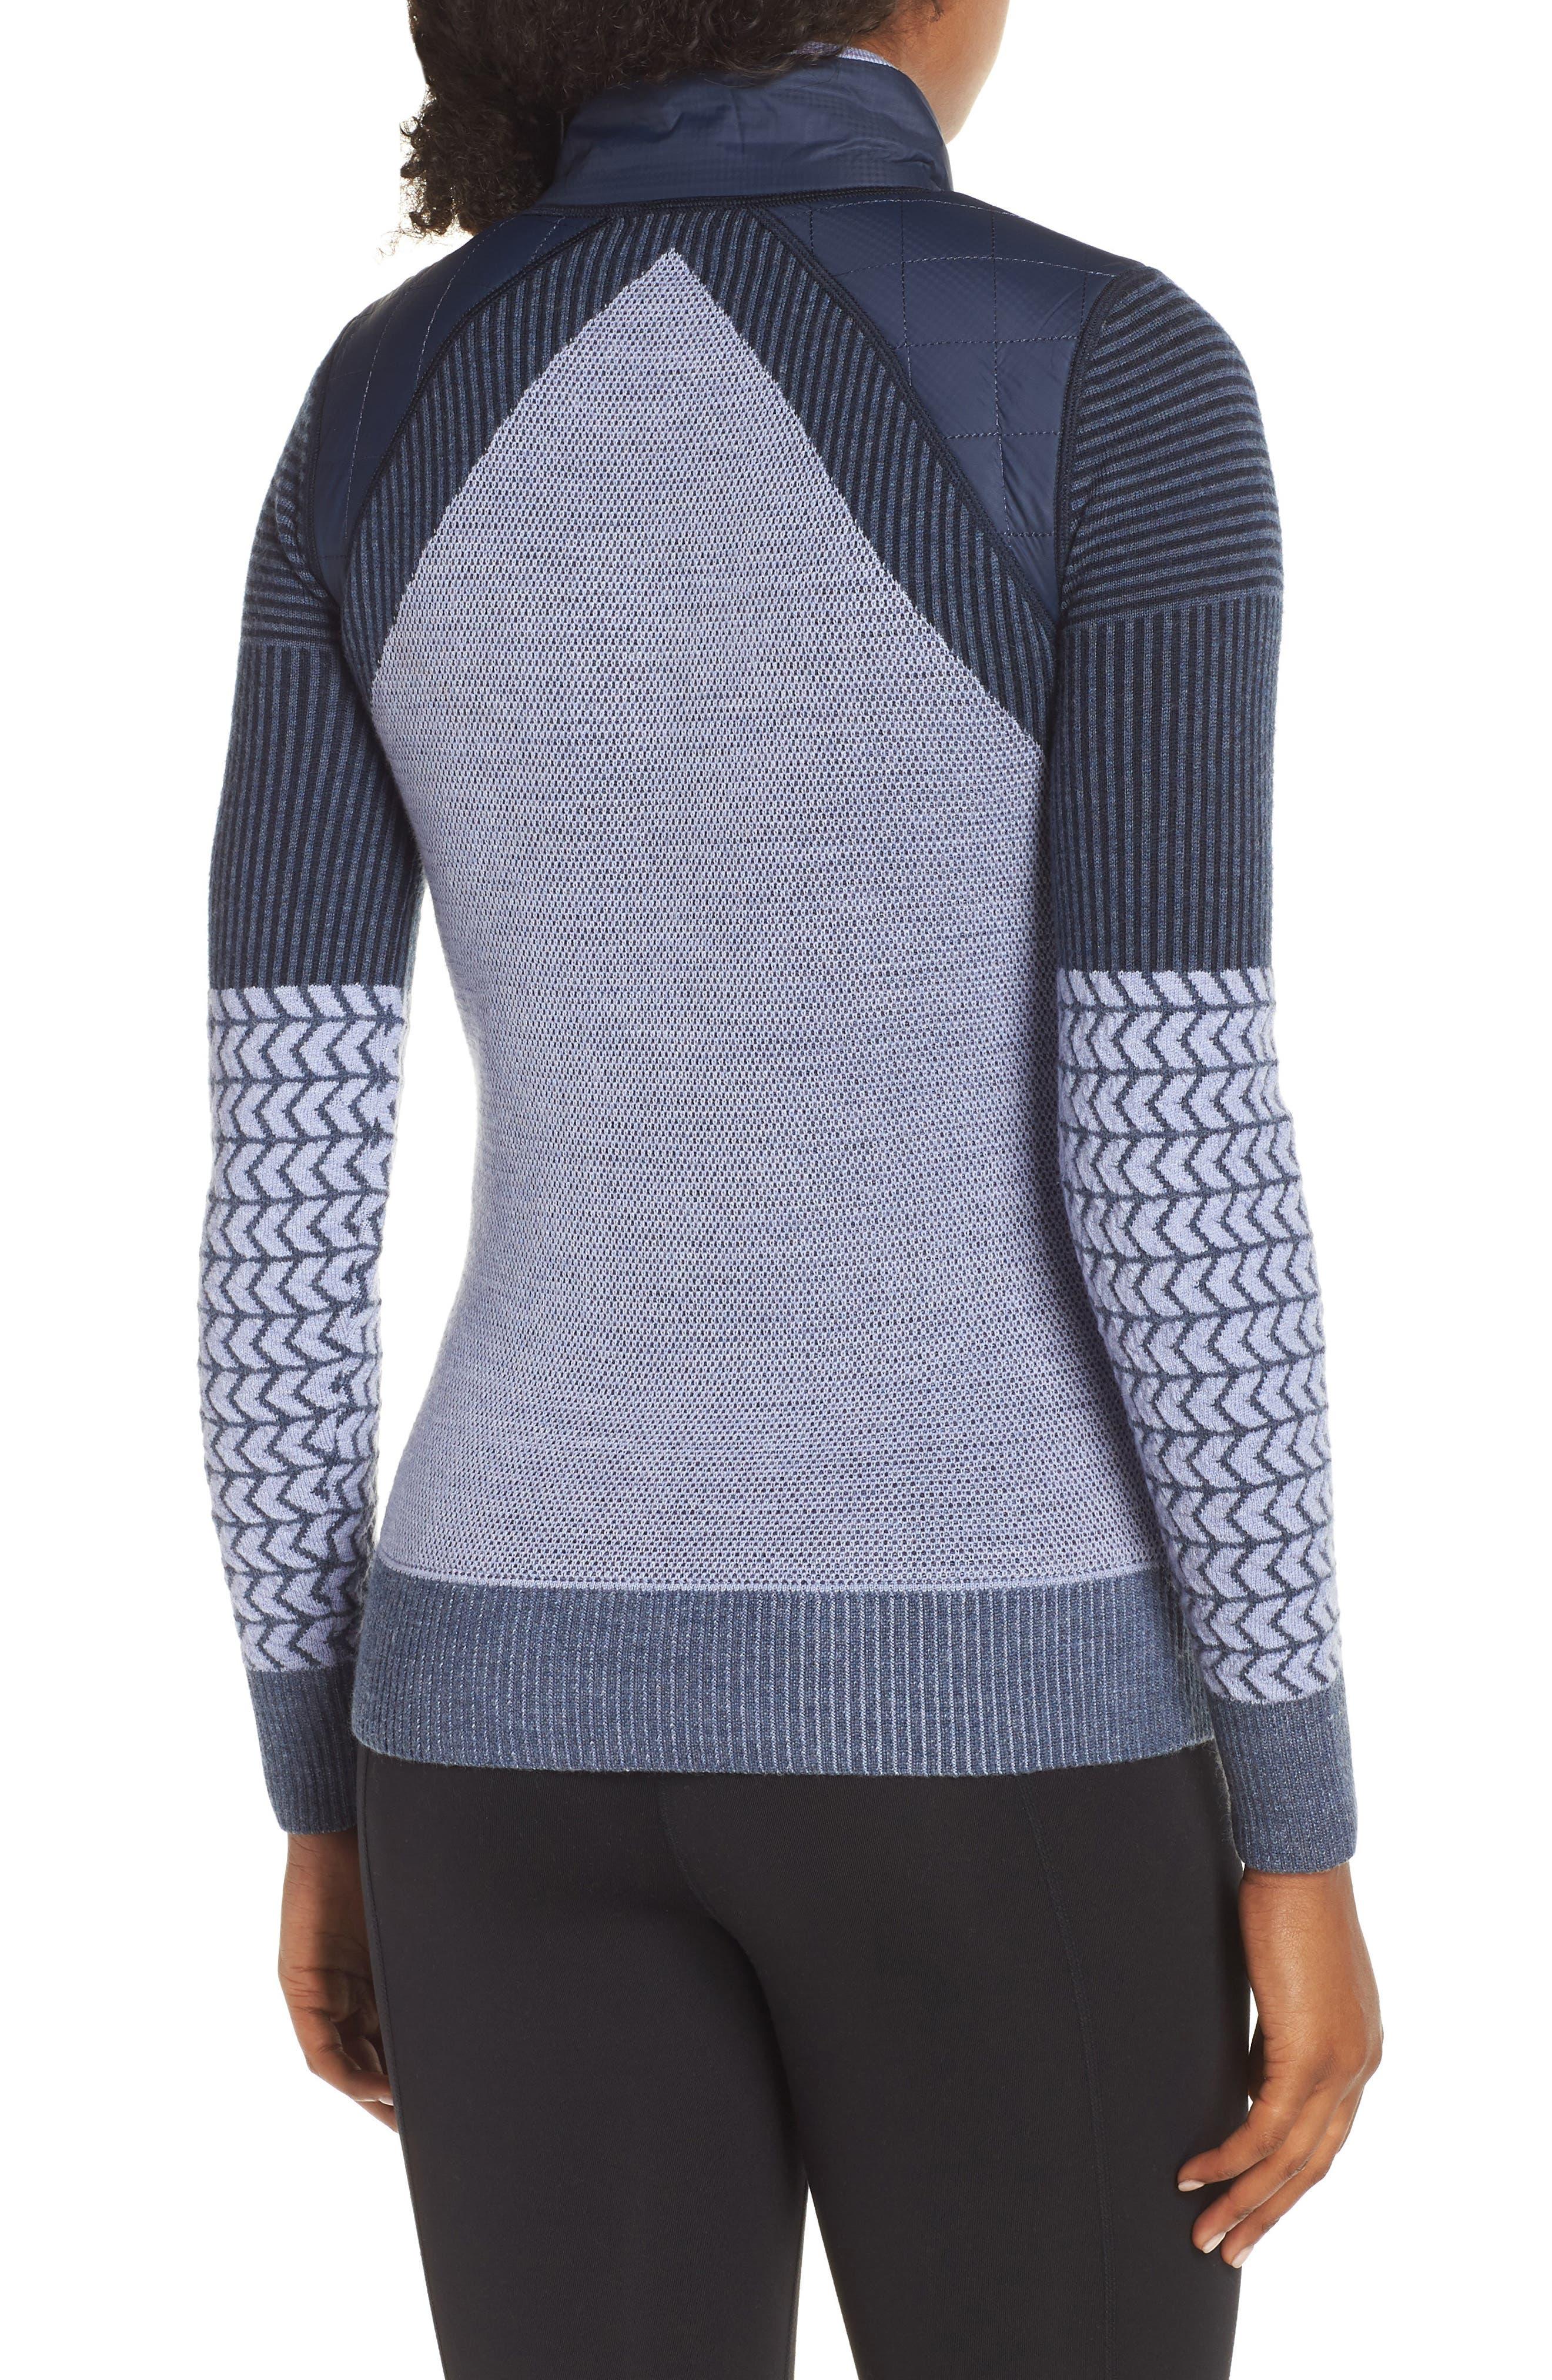 Ski Ninja Pullover Sweater,                             Alternate thumbnail 2, color,                             410